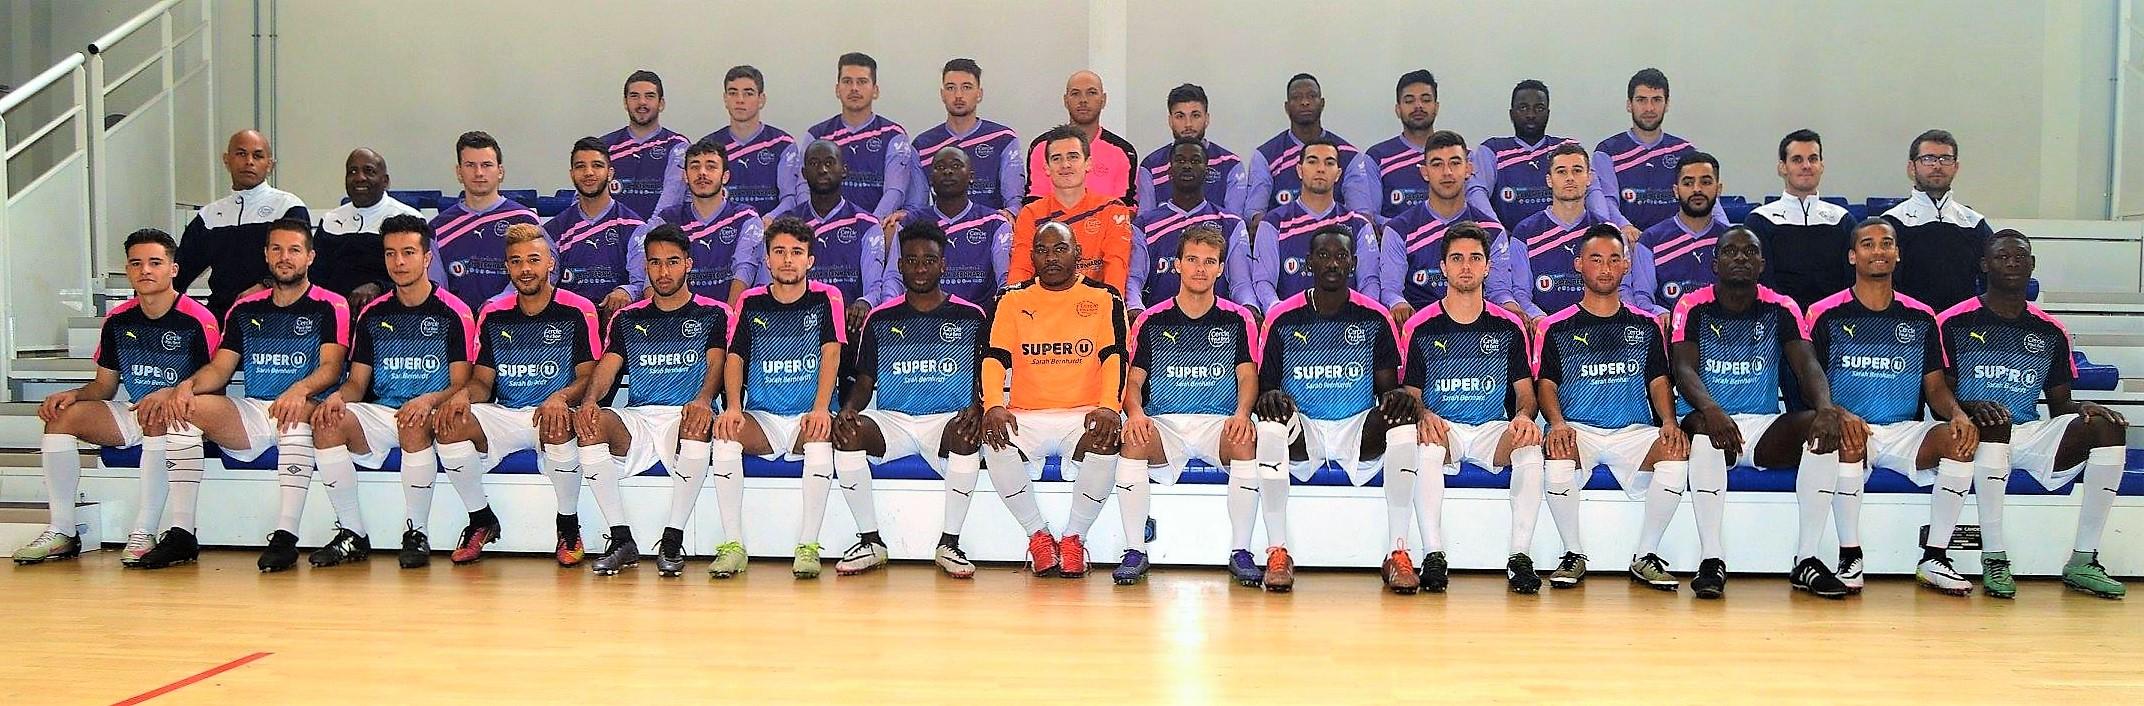 2016-2017-seniors-h-ligue